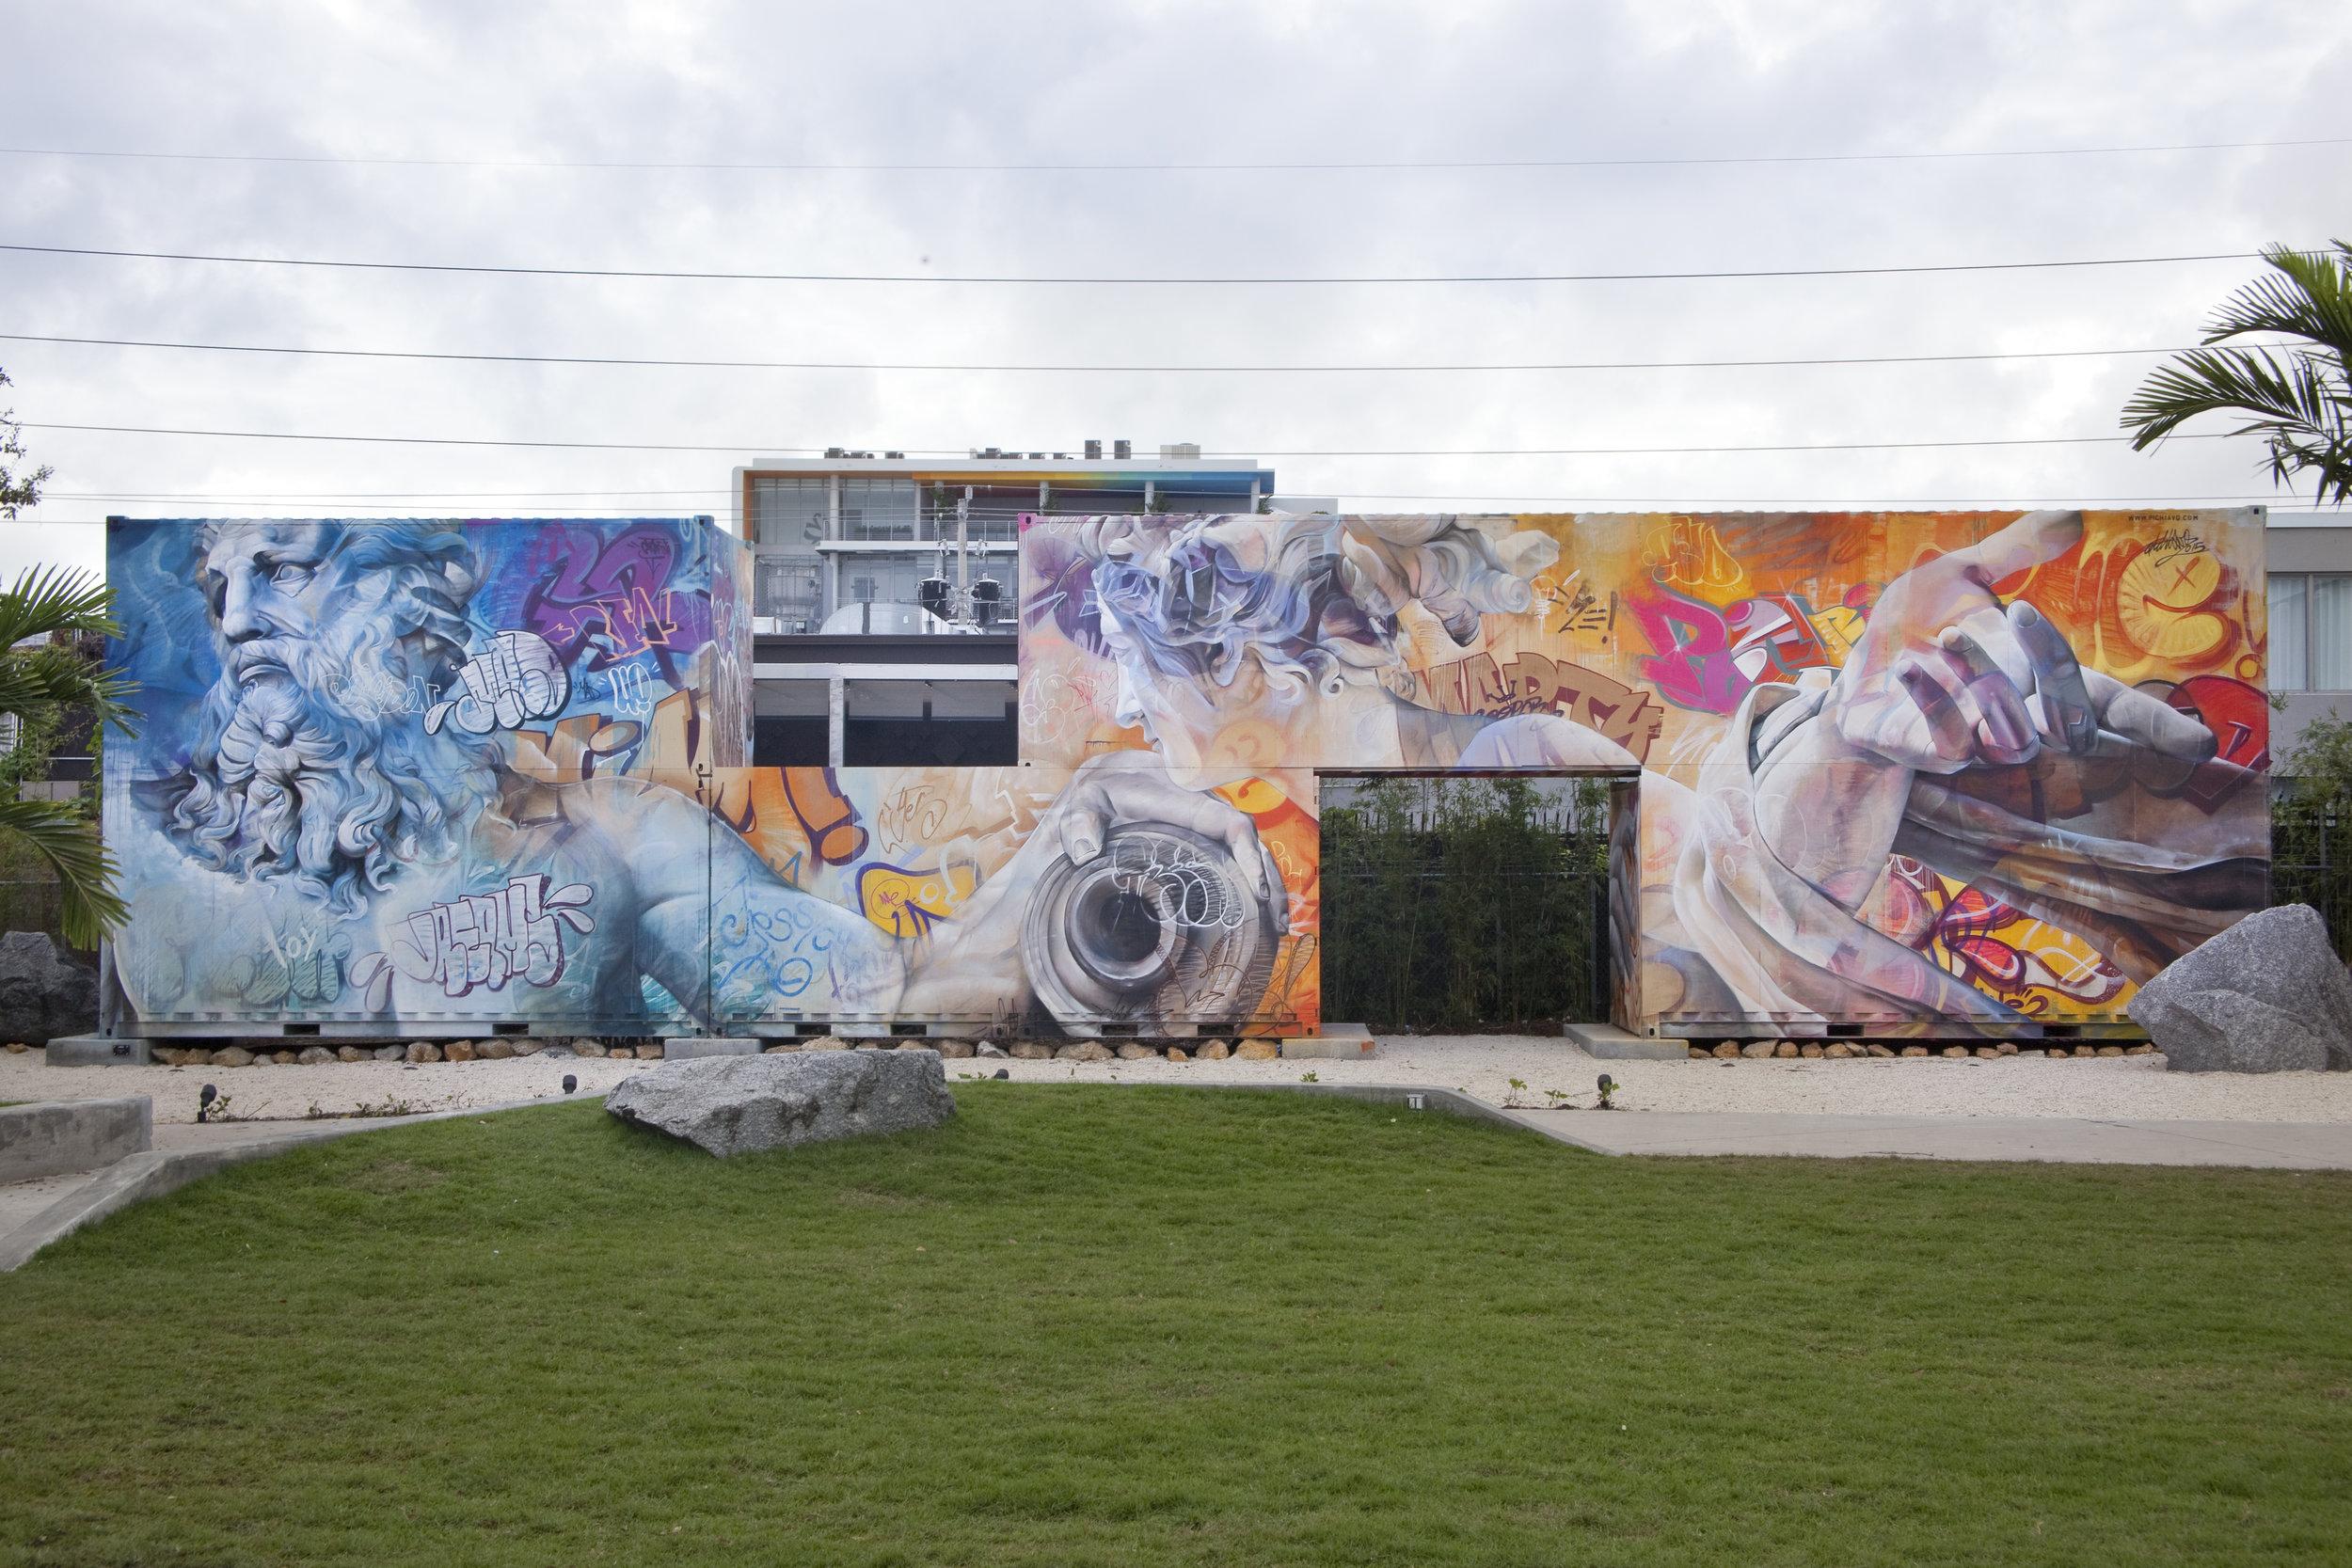 MURAL BY PICHI & AVO INSIDE THE WYNWOOD WALLS